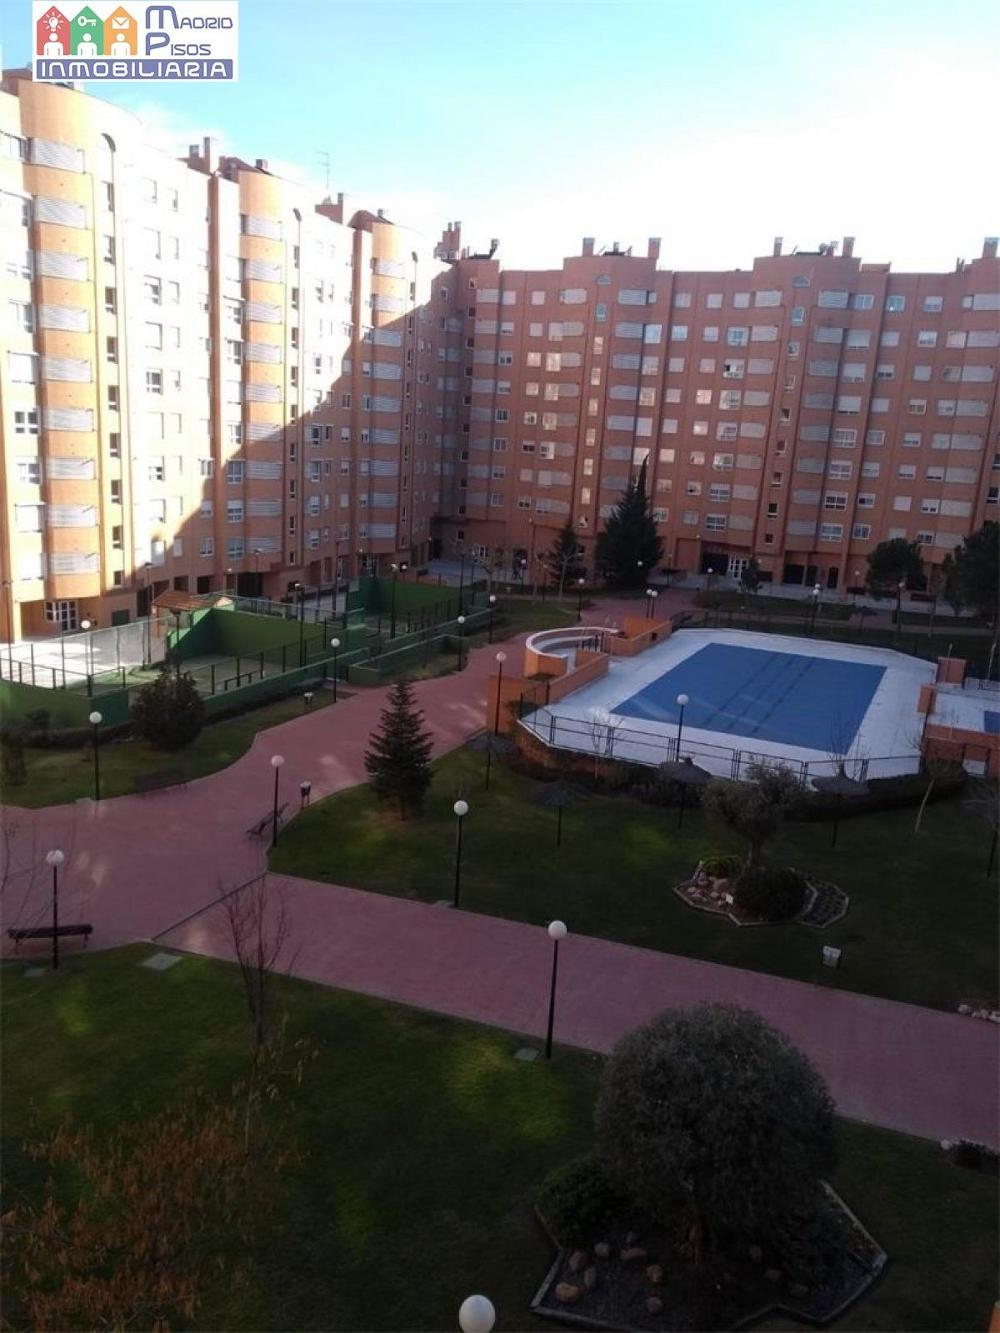 carabanchel-vista alegre madrid piso foto 3685659